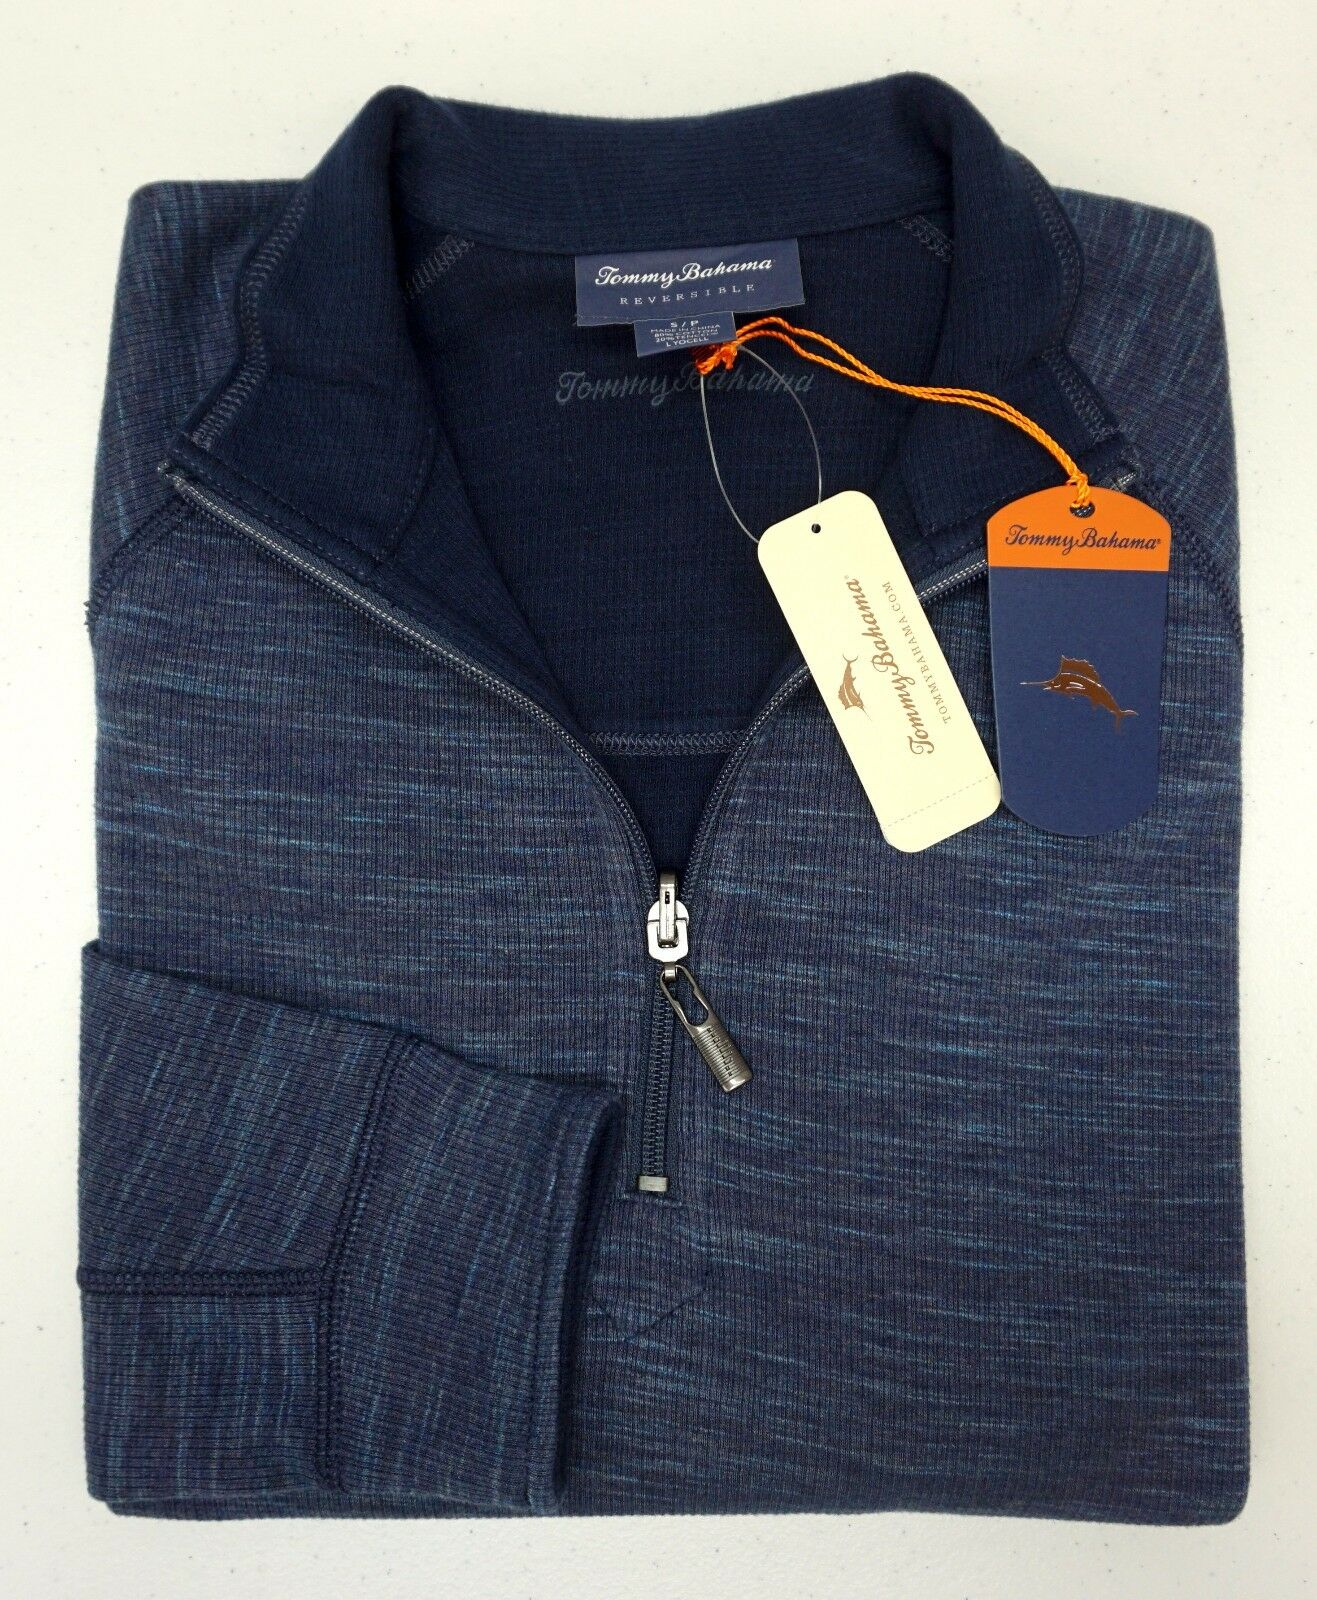 NWT 98 Tommy Bahama Blau Reversible 1/4 Zip Sweater  Herren Größe S Heather NEW